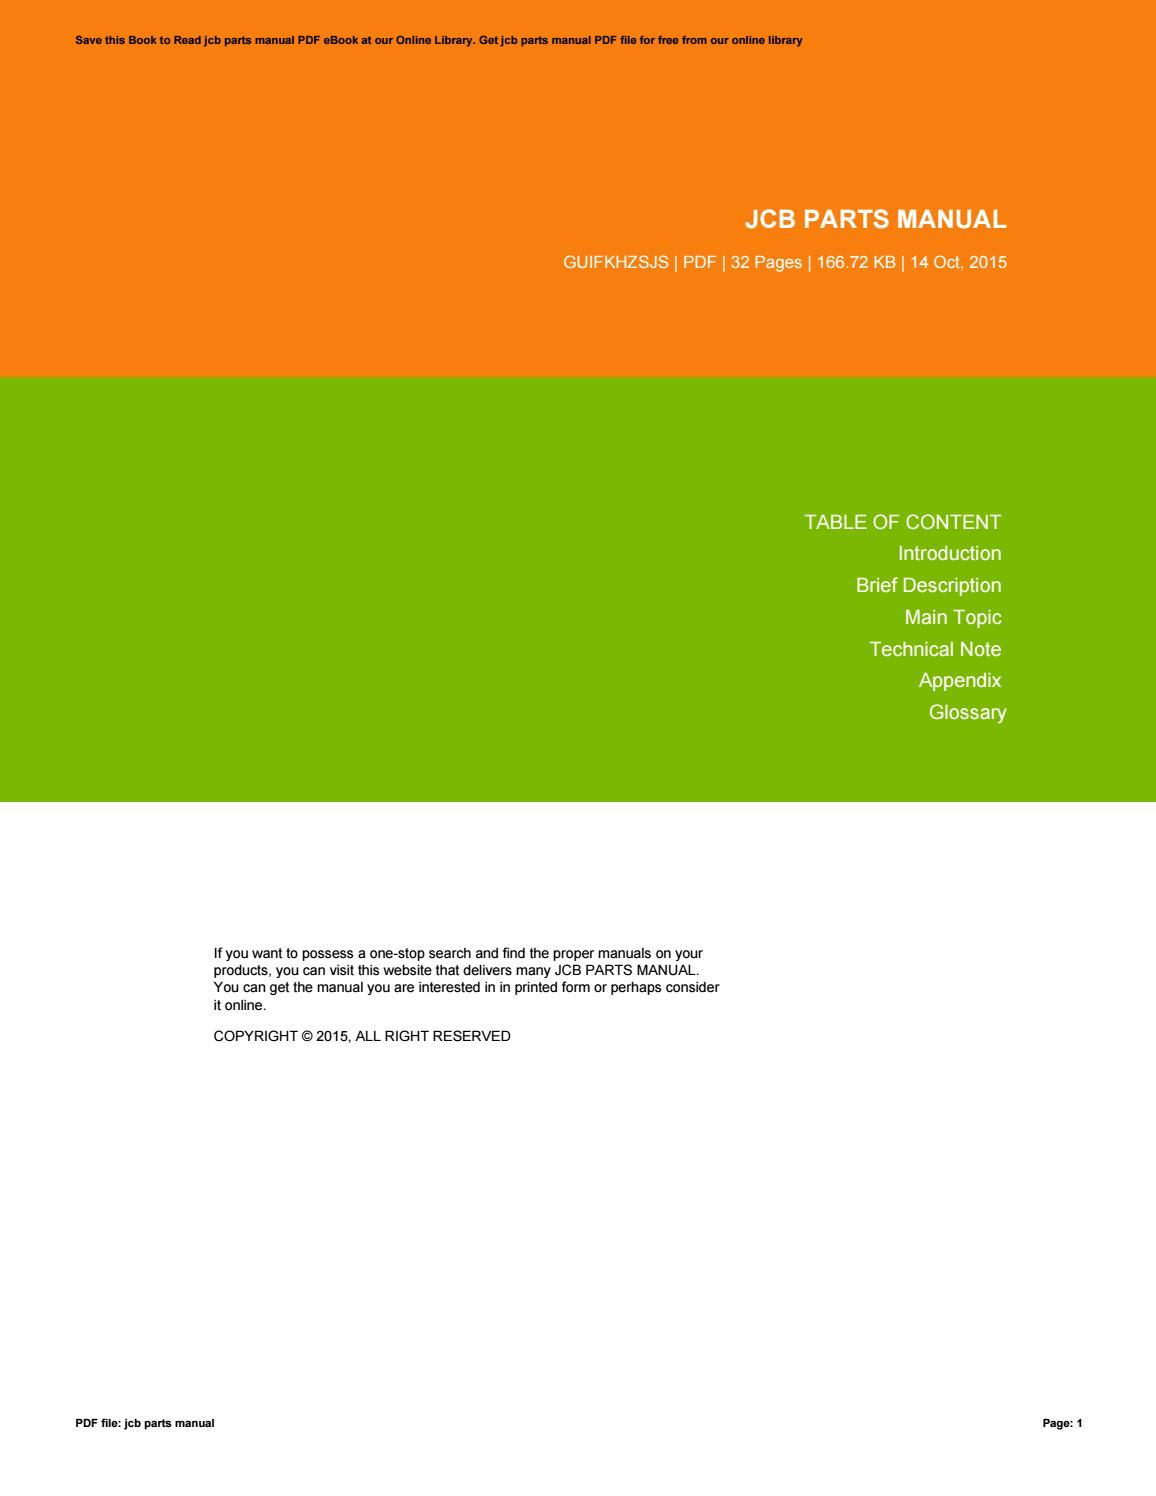 Jcb parts manual online